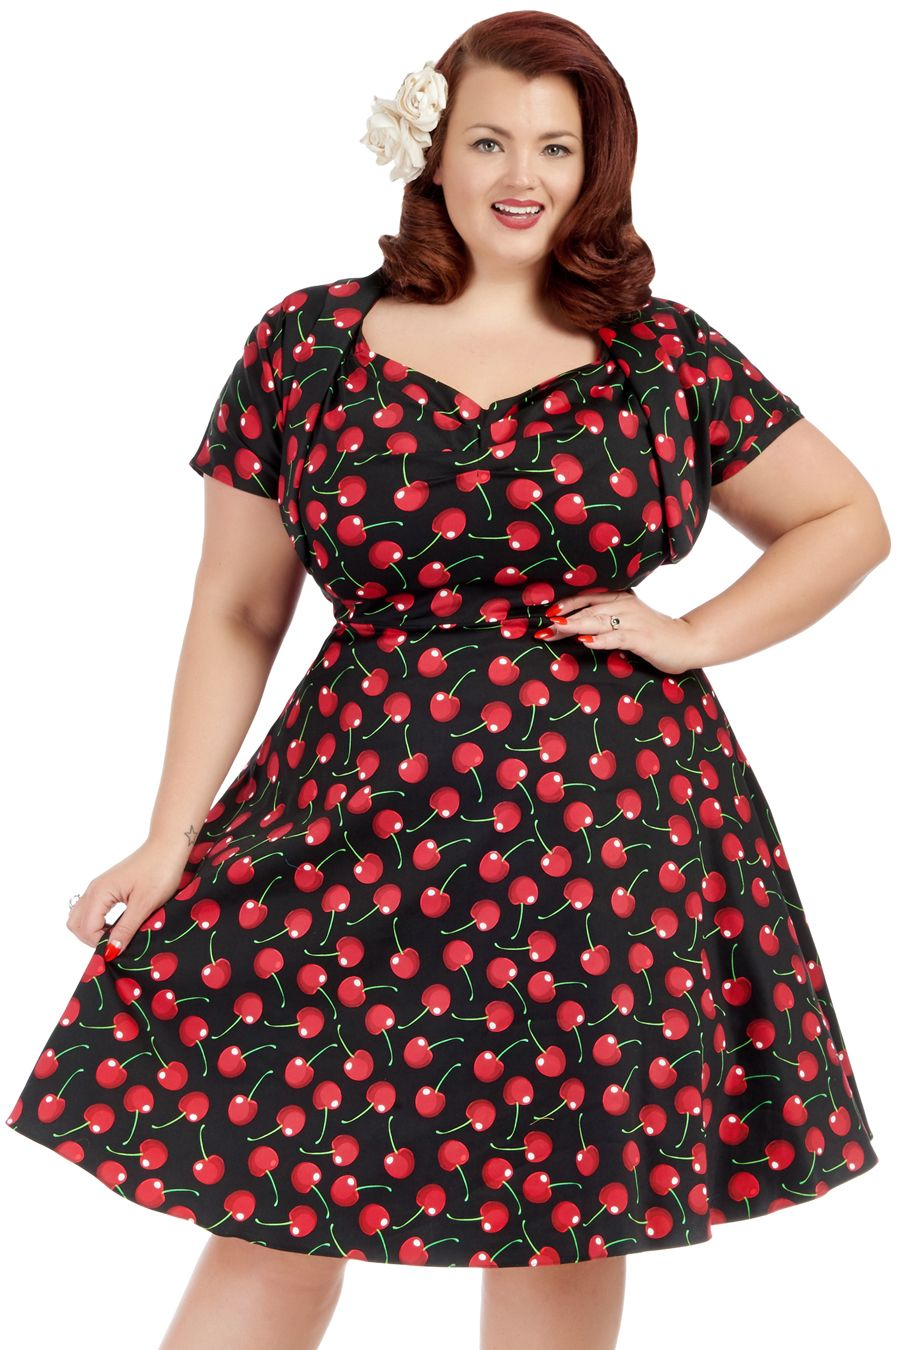 f1776b0f51 Cherries on Black Bolero Sweetheart Dress : Lady Voluptuous ...